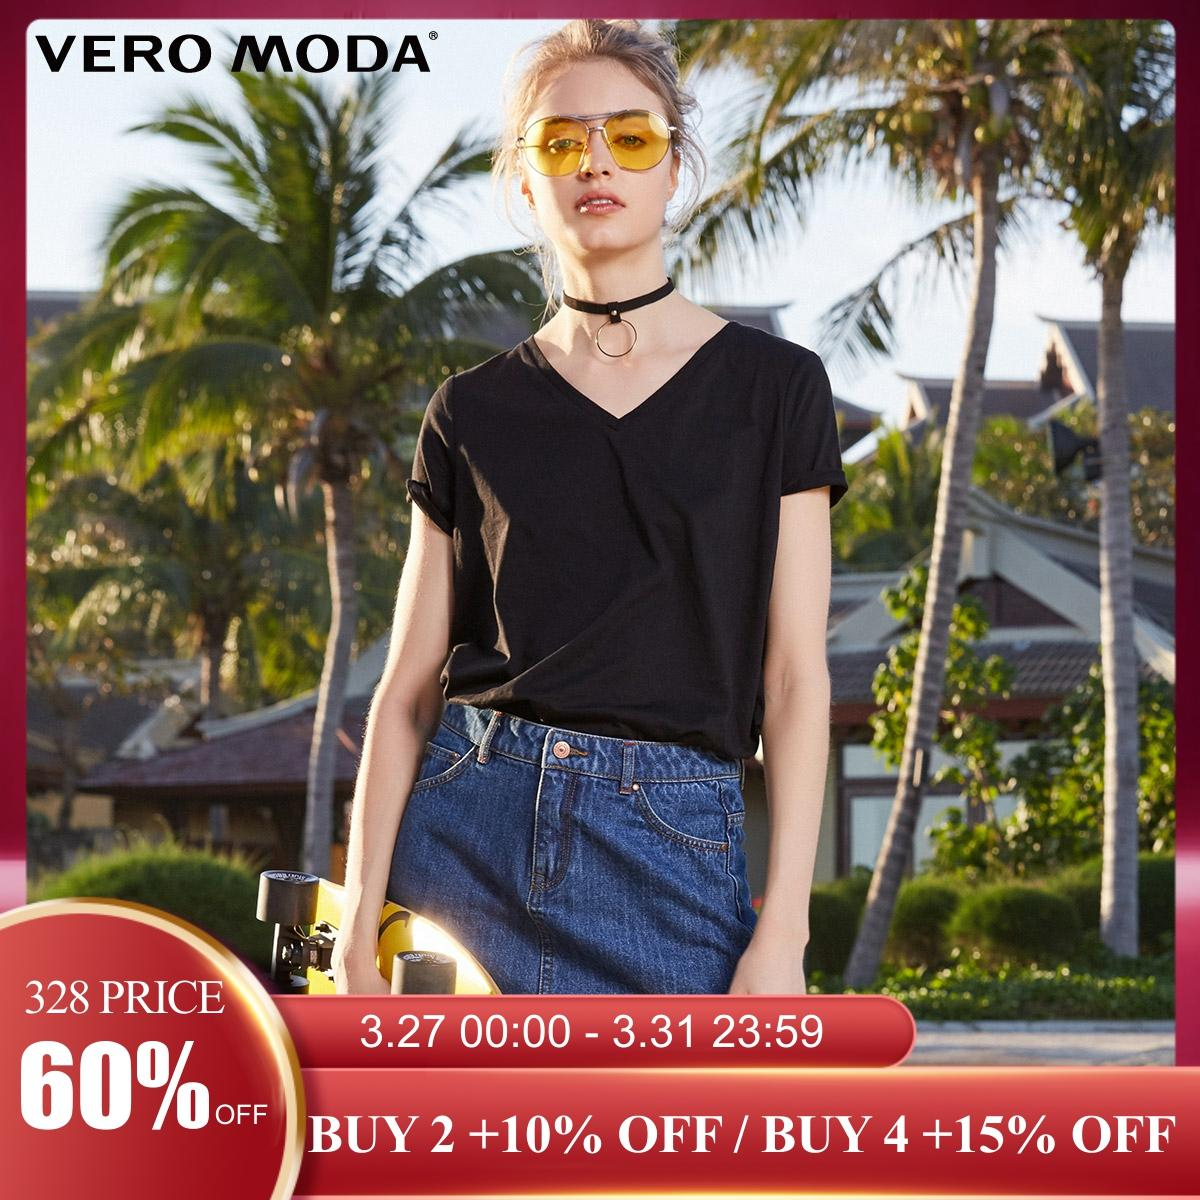 Vero Moda Women's 100% Cotton Pure Color V-neck T-Shirt | 317101513